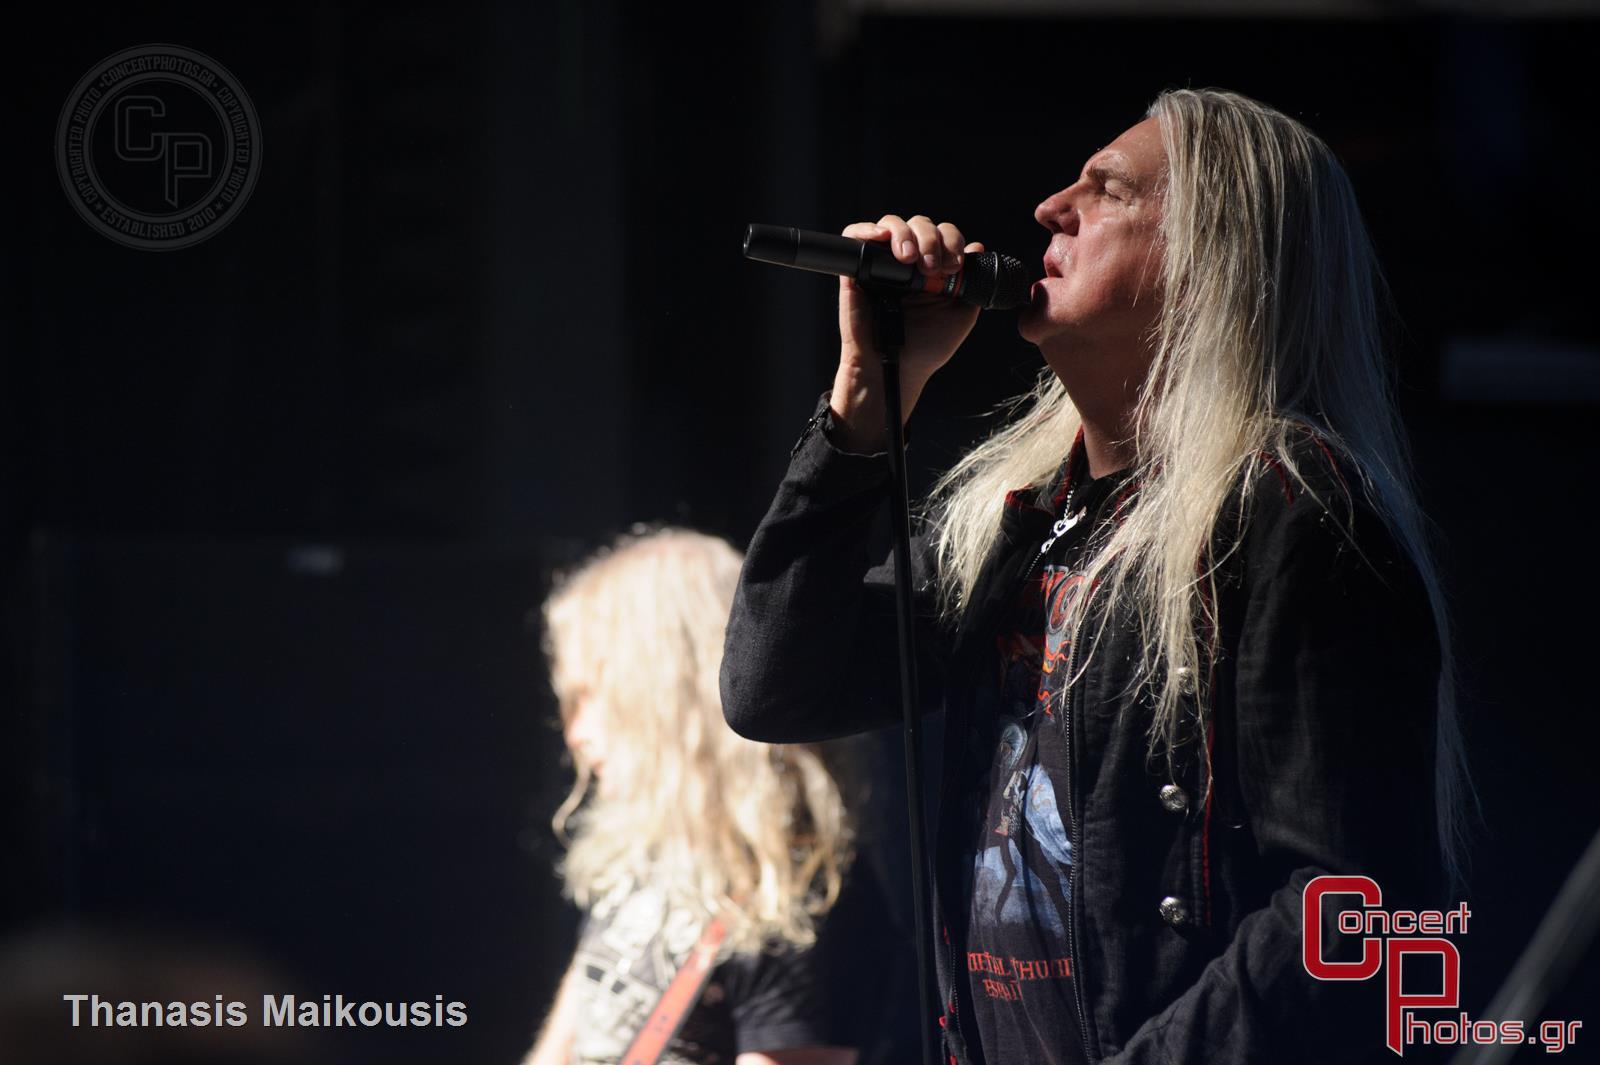 Saxon & Innerwish -Saxon Innerwish Gagarin photographer: Thanasis Maikousis - concertphotos_20141025_22_46_30